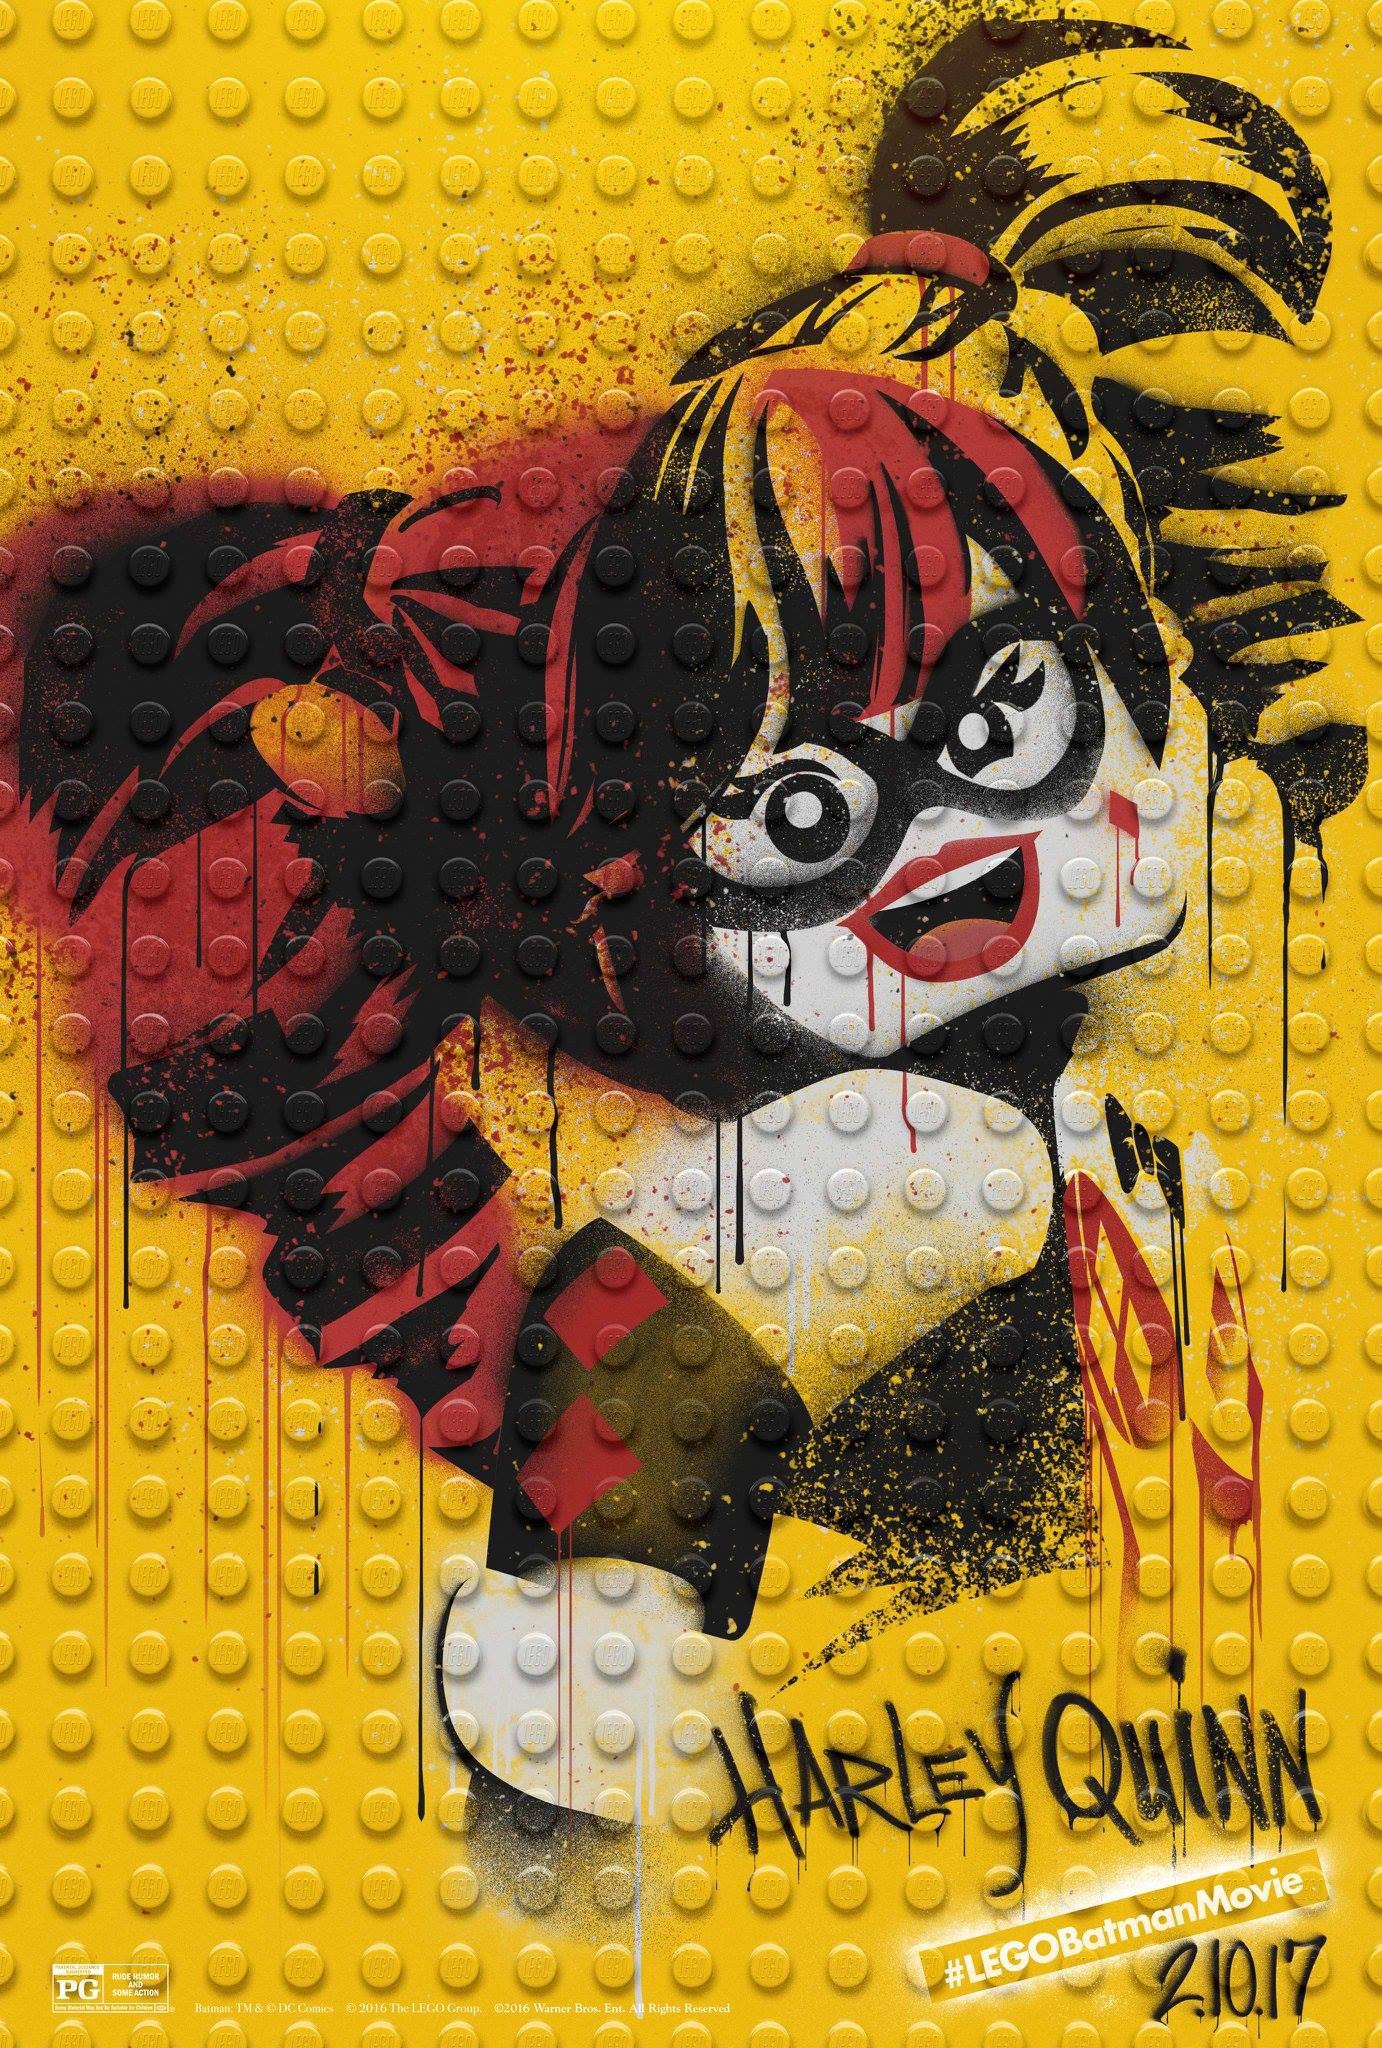 lego_batman_movie_p17.png